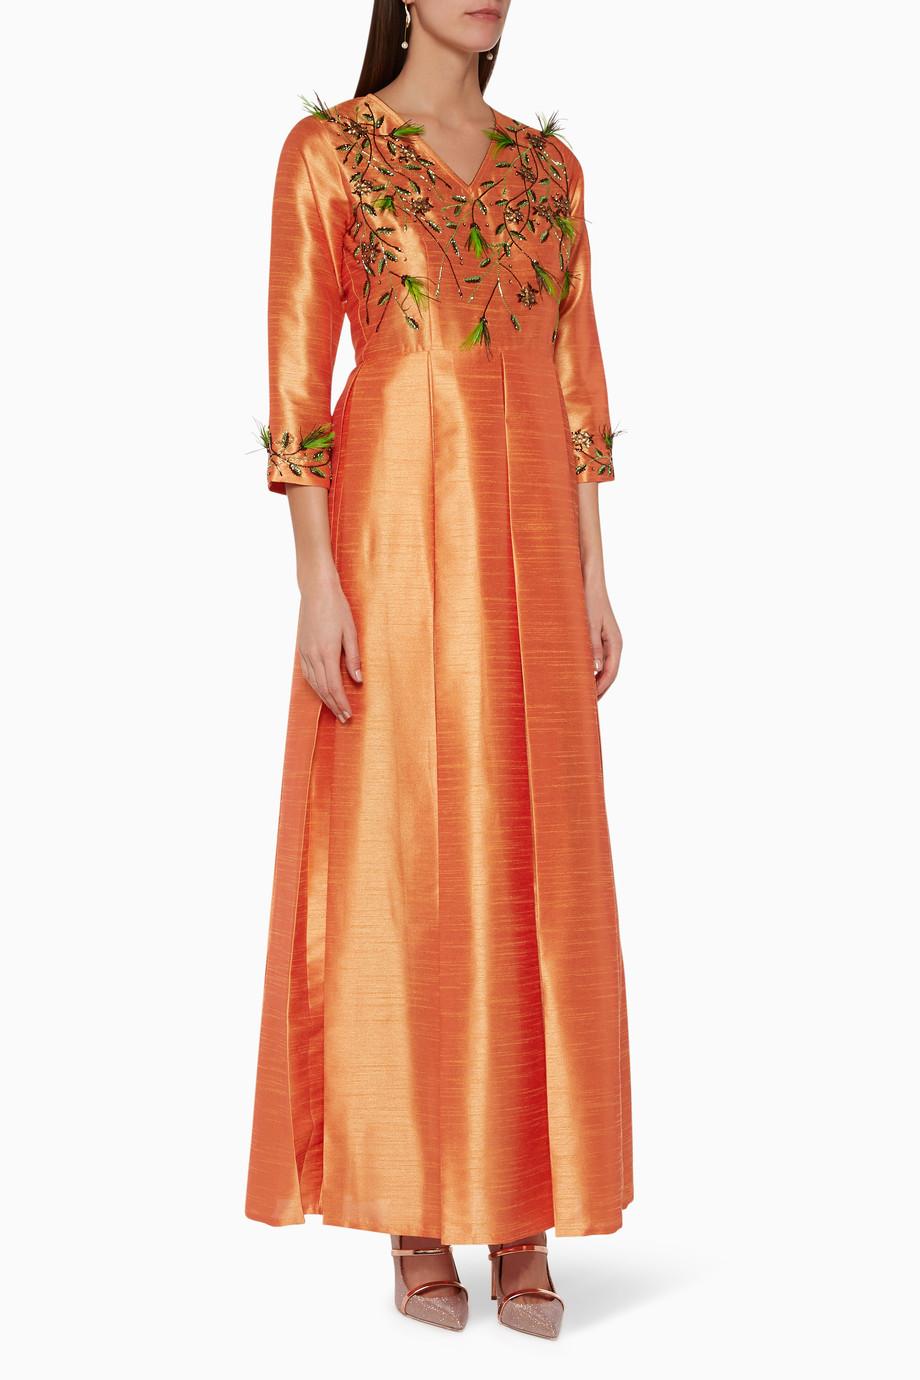 0331e8311dca4 Shop SHAIRA Orange Embellished Silk Kaftan for Women